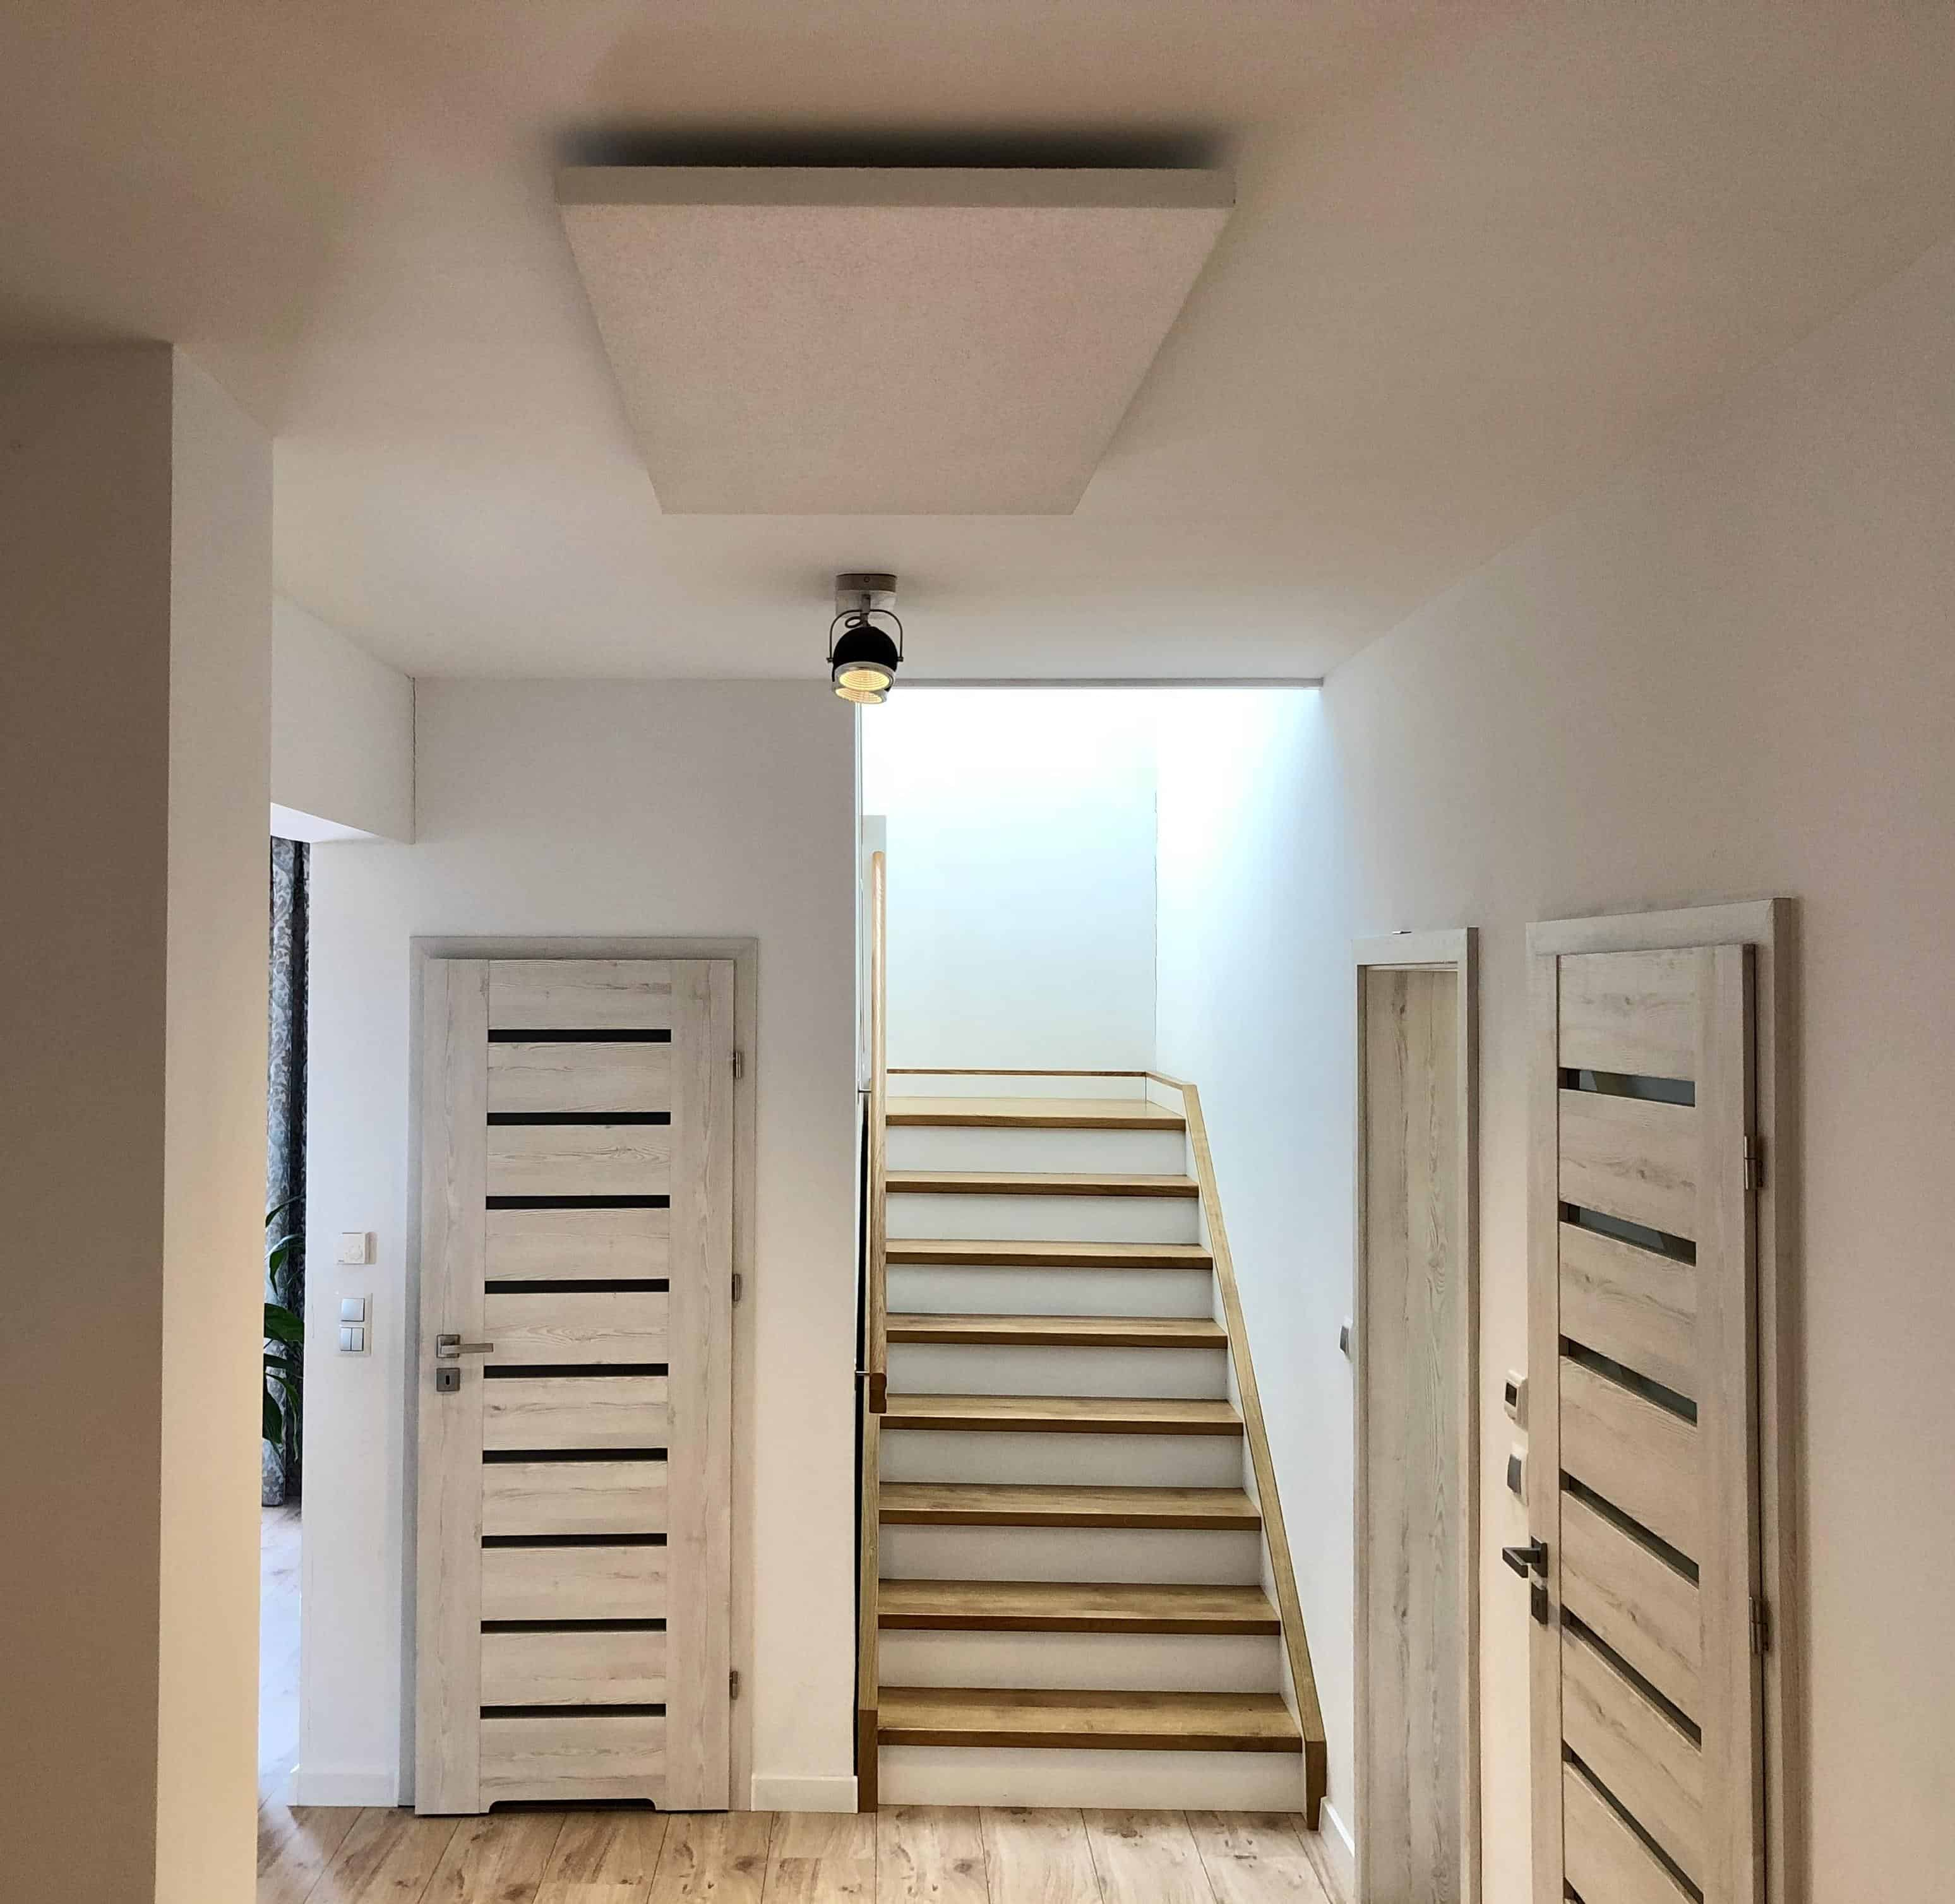 korytarz - Standard radiators